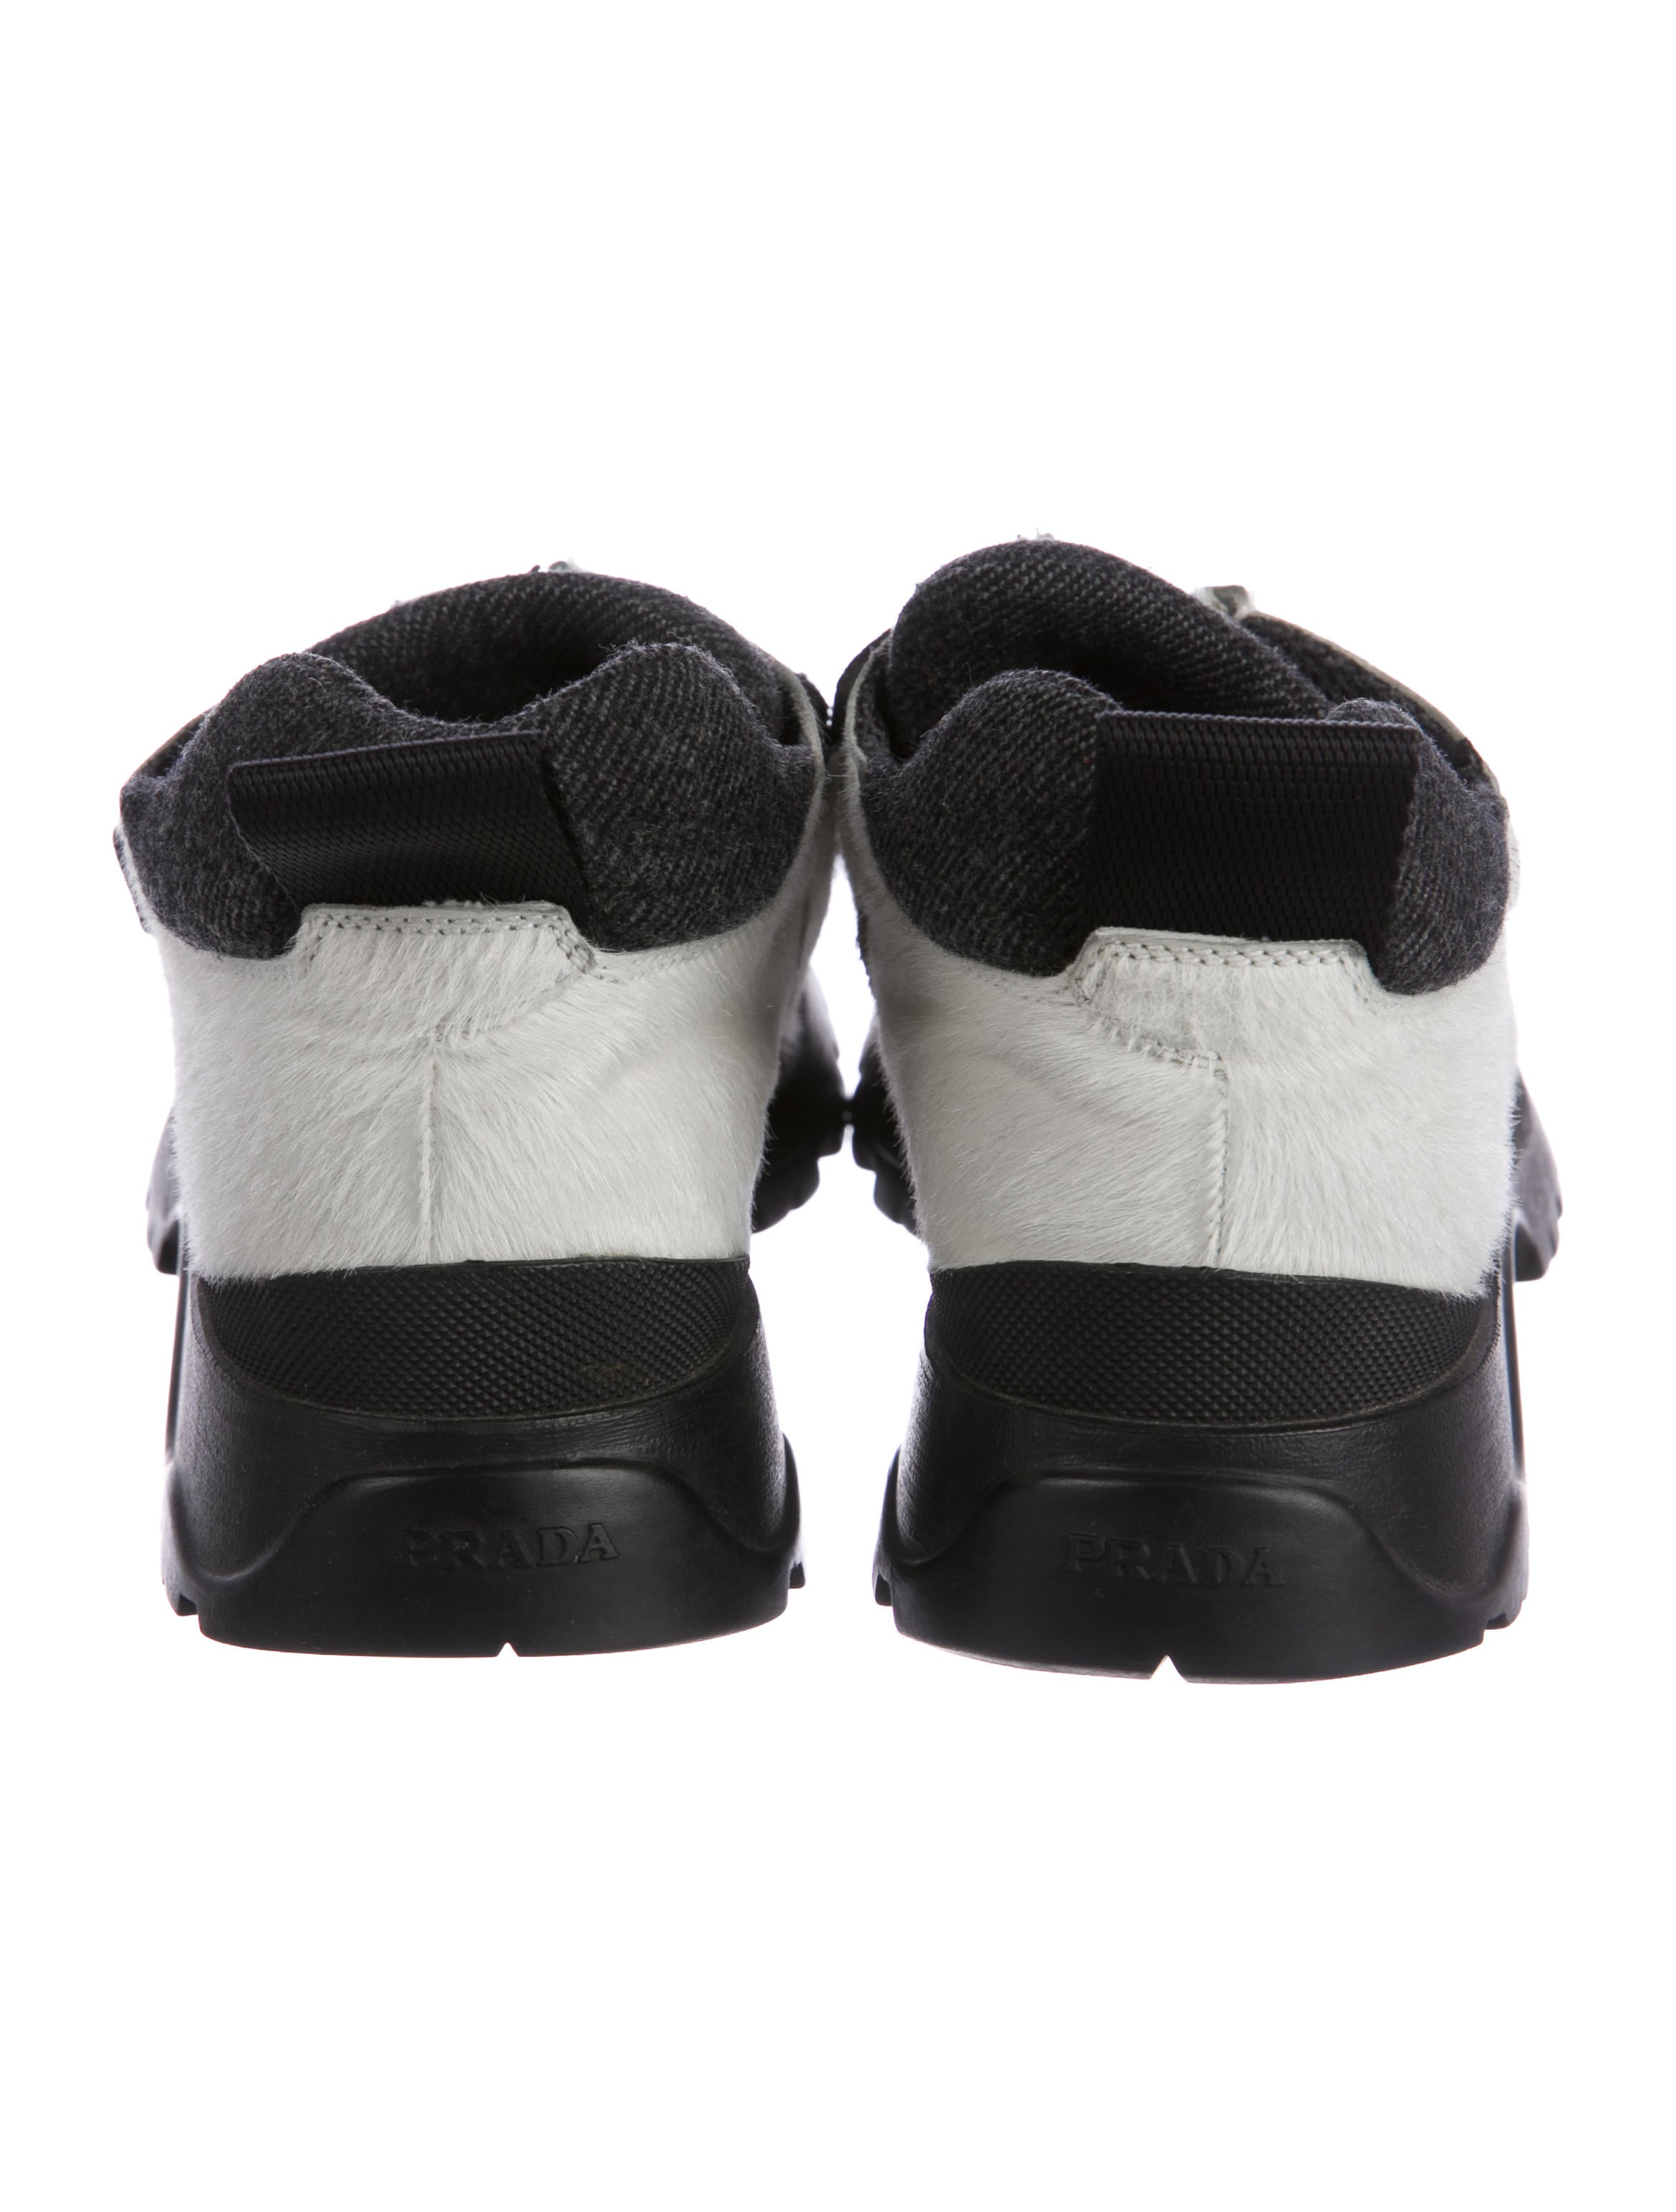 Prada Ponyhair Square-Toe Sneakers discount 2014 unisex for sale discount sale sbdOGV